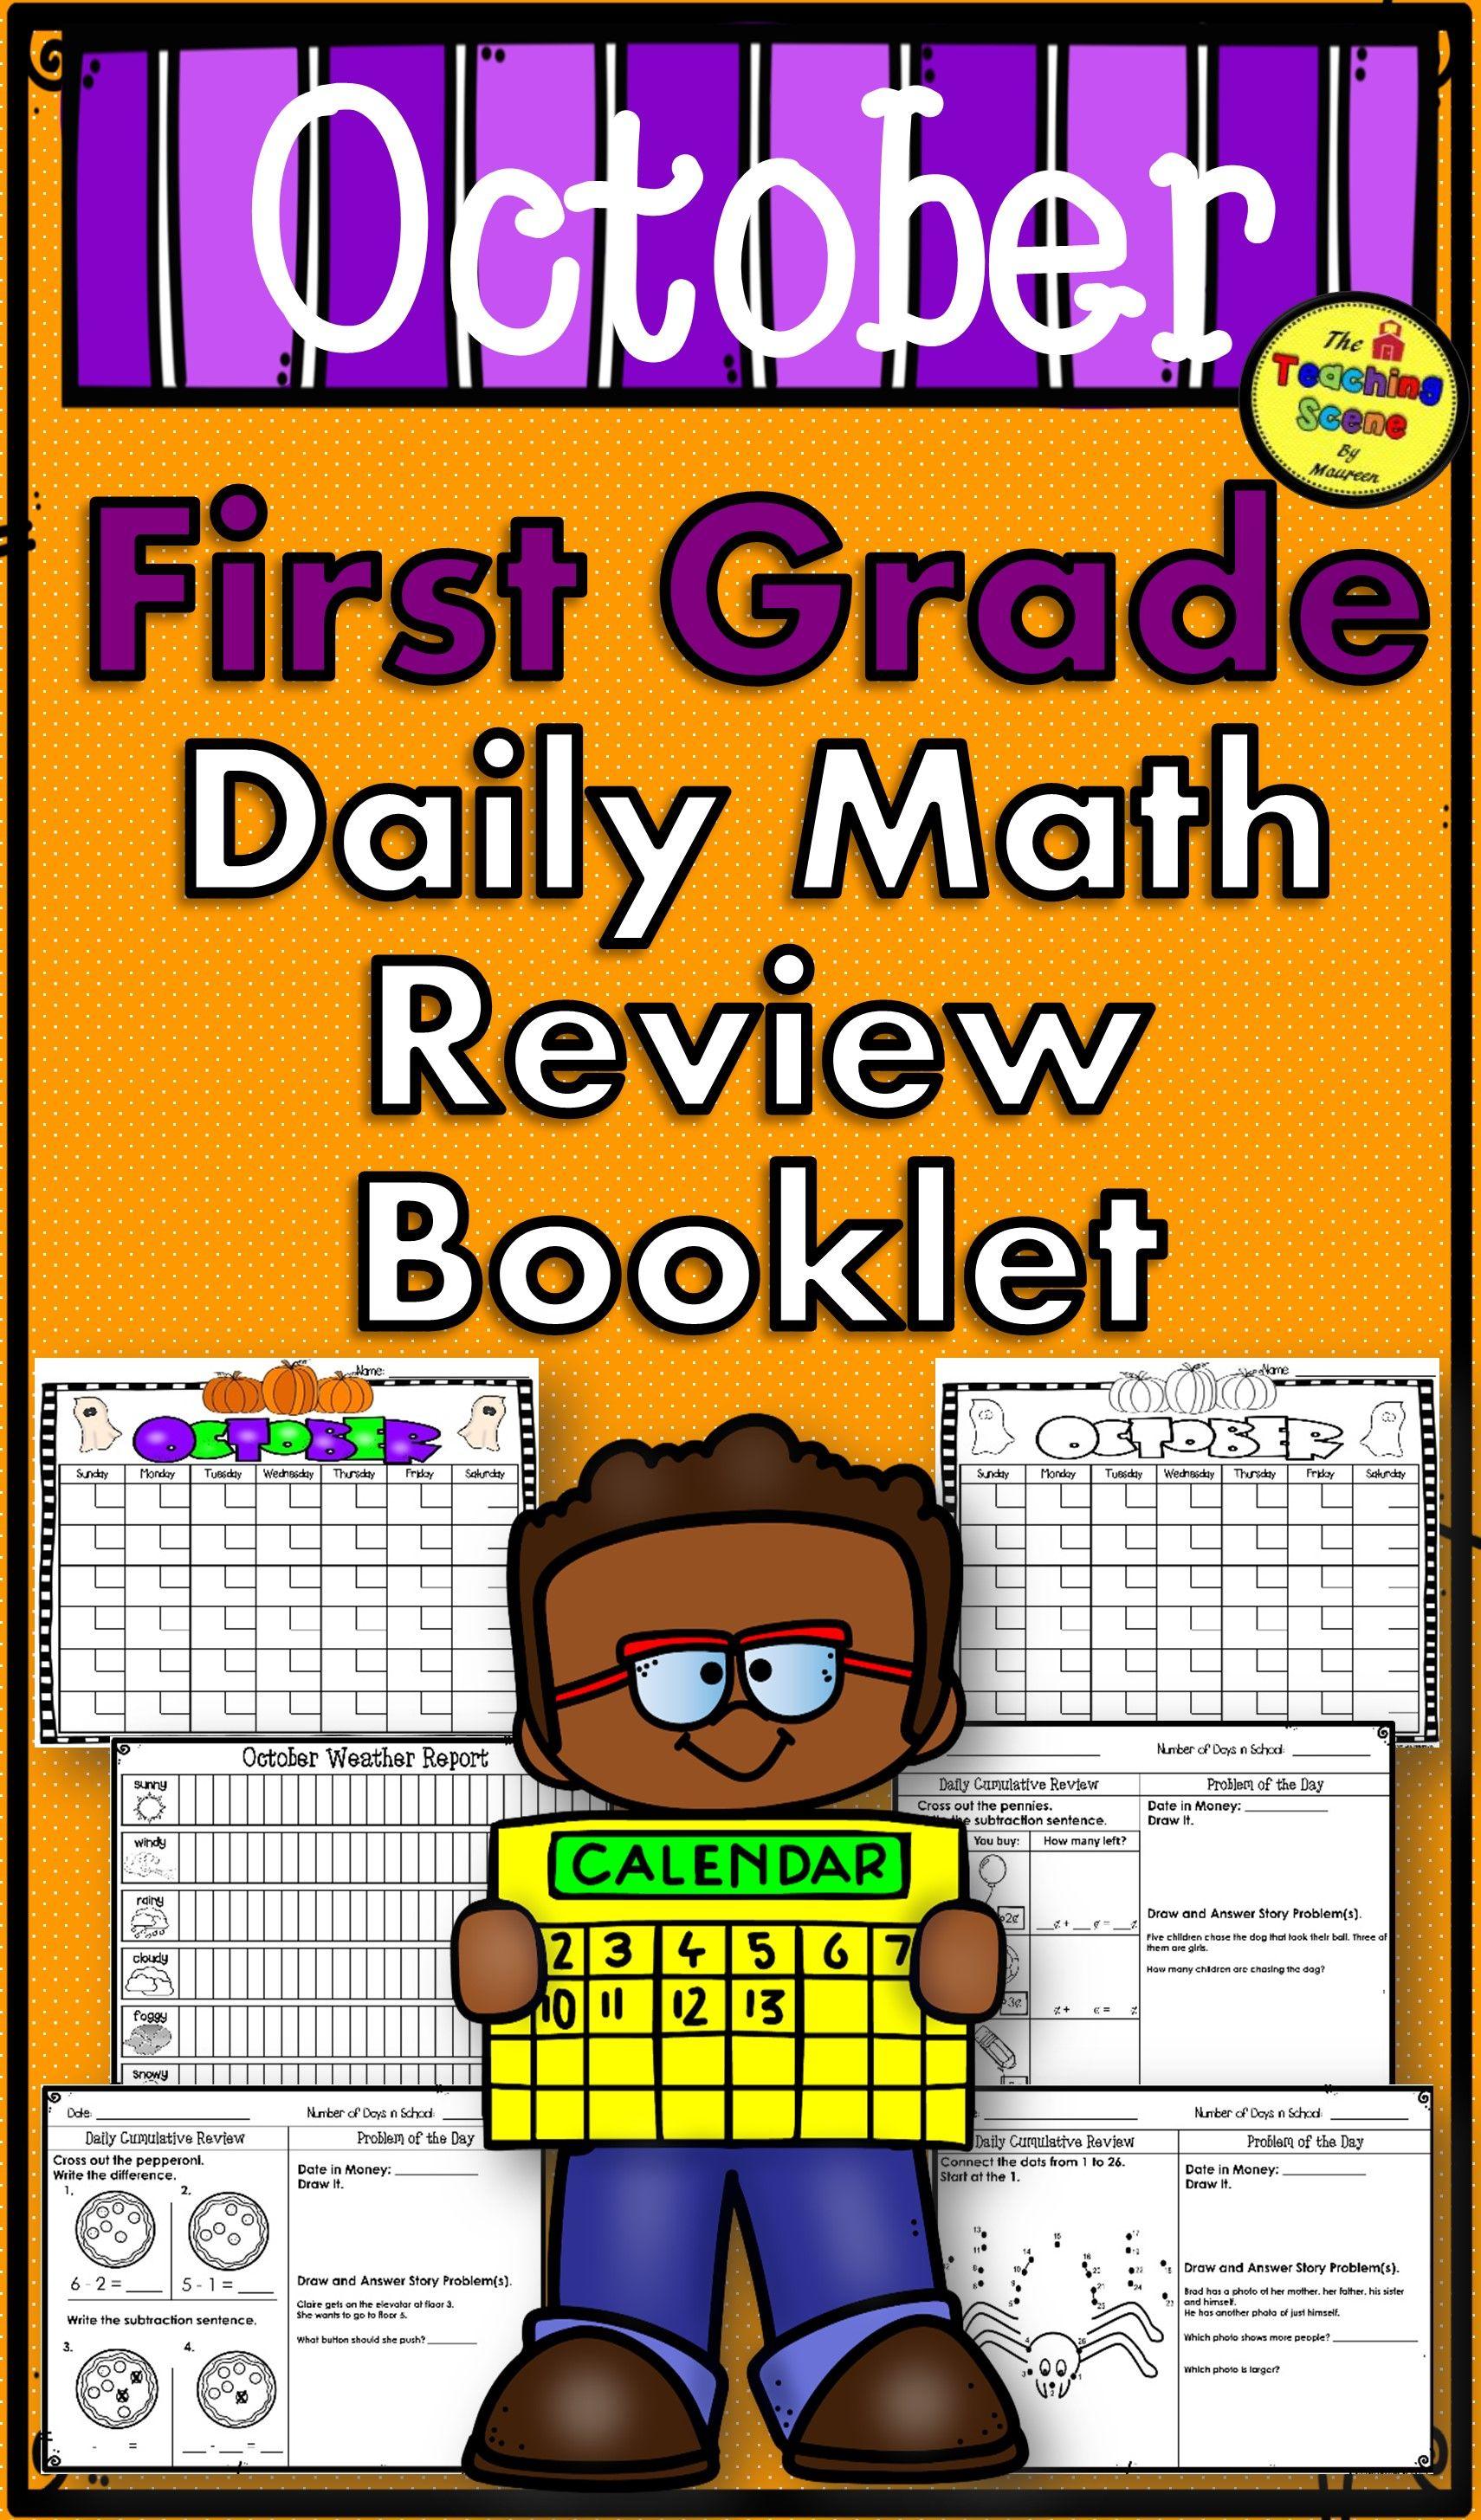 First Grade Daily Calendar Amp Math Review Booklet October